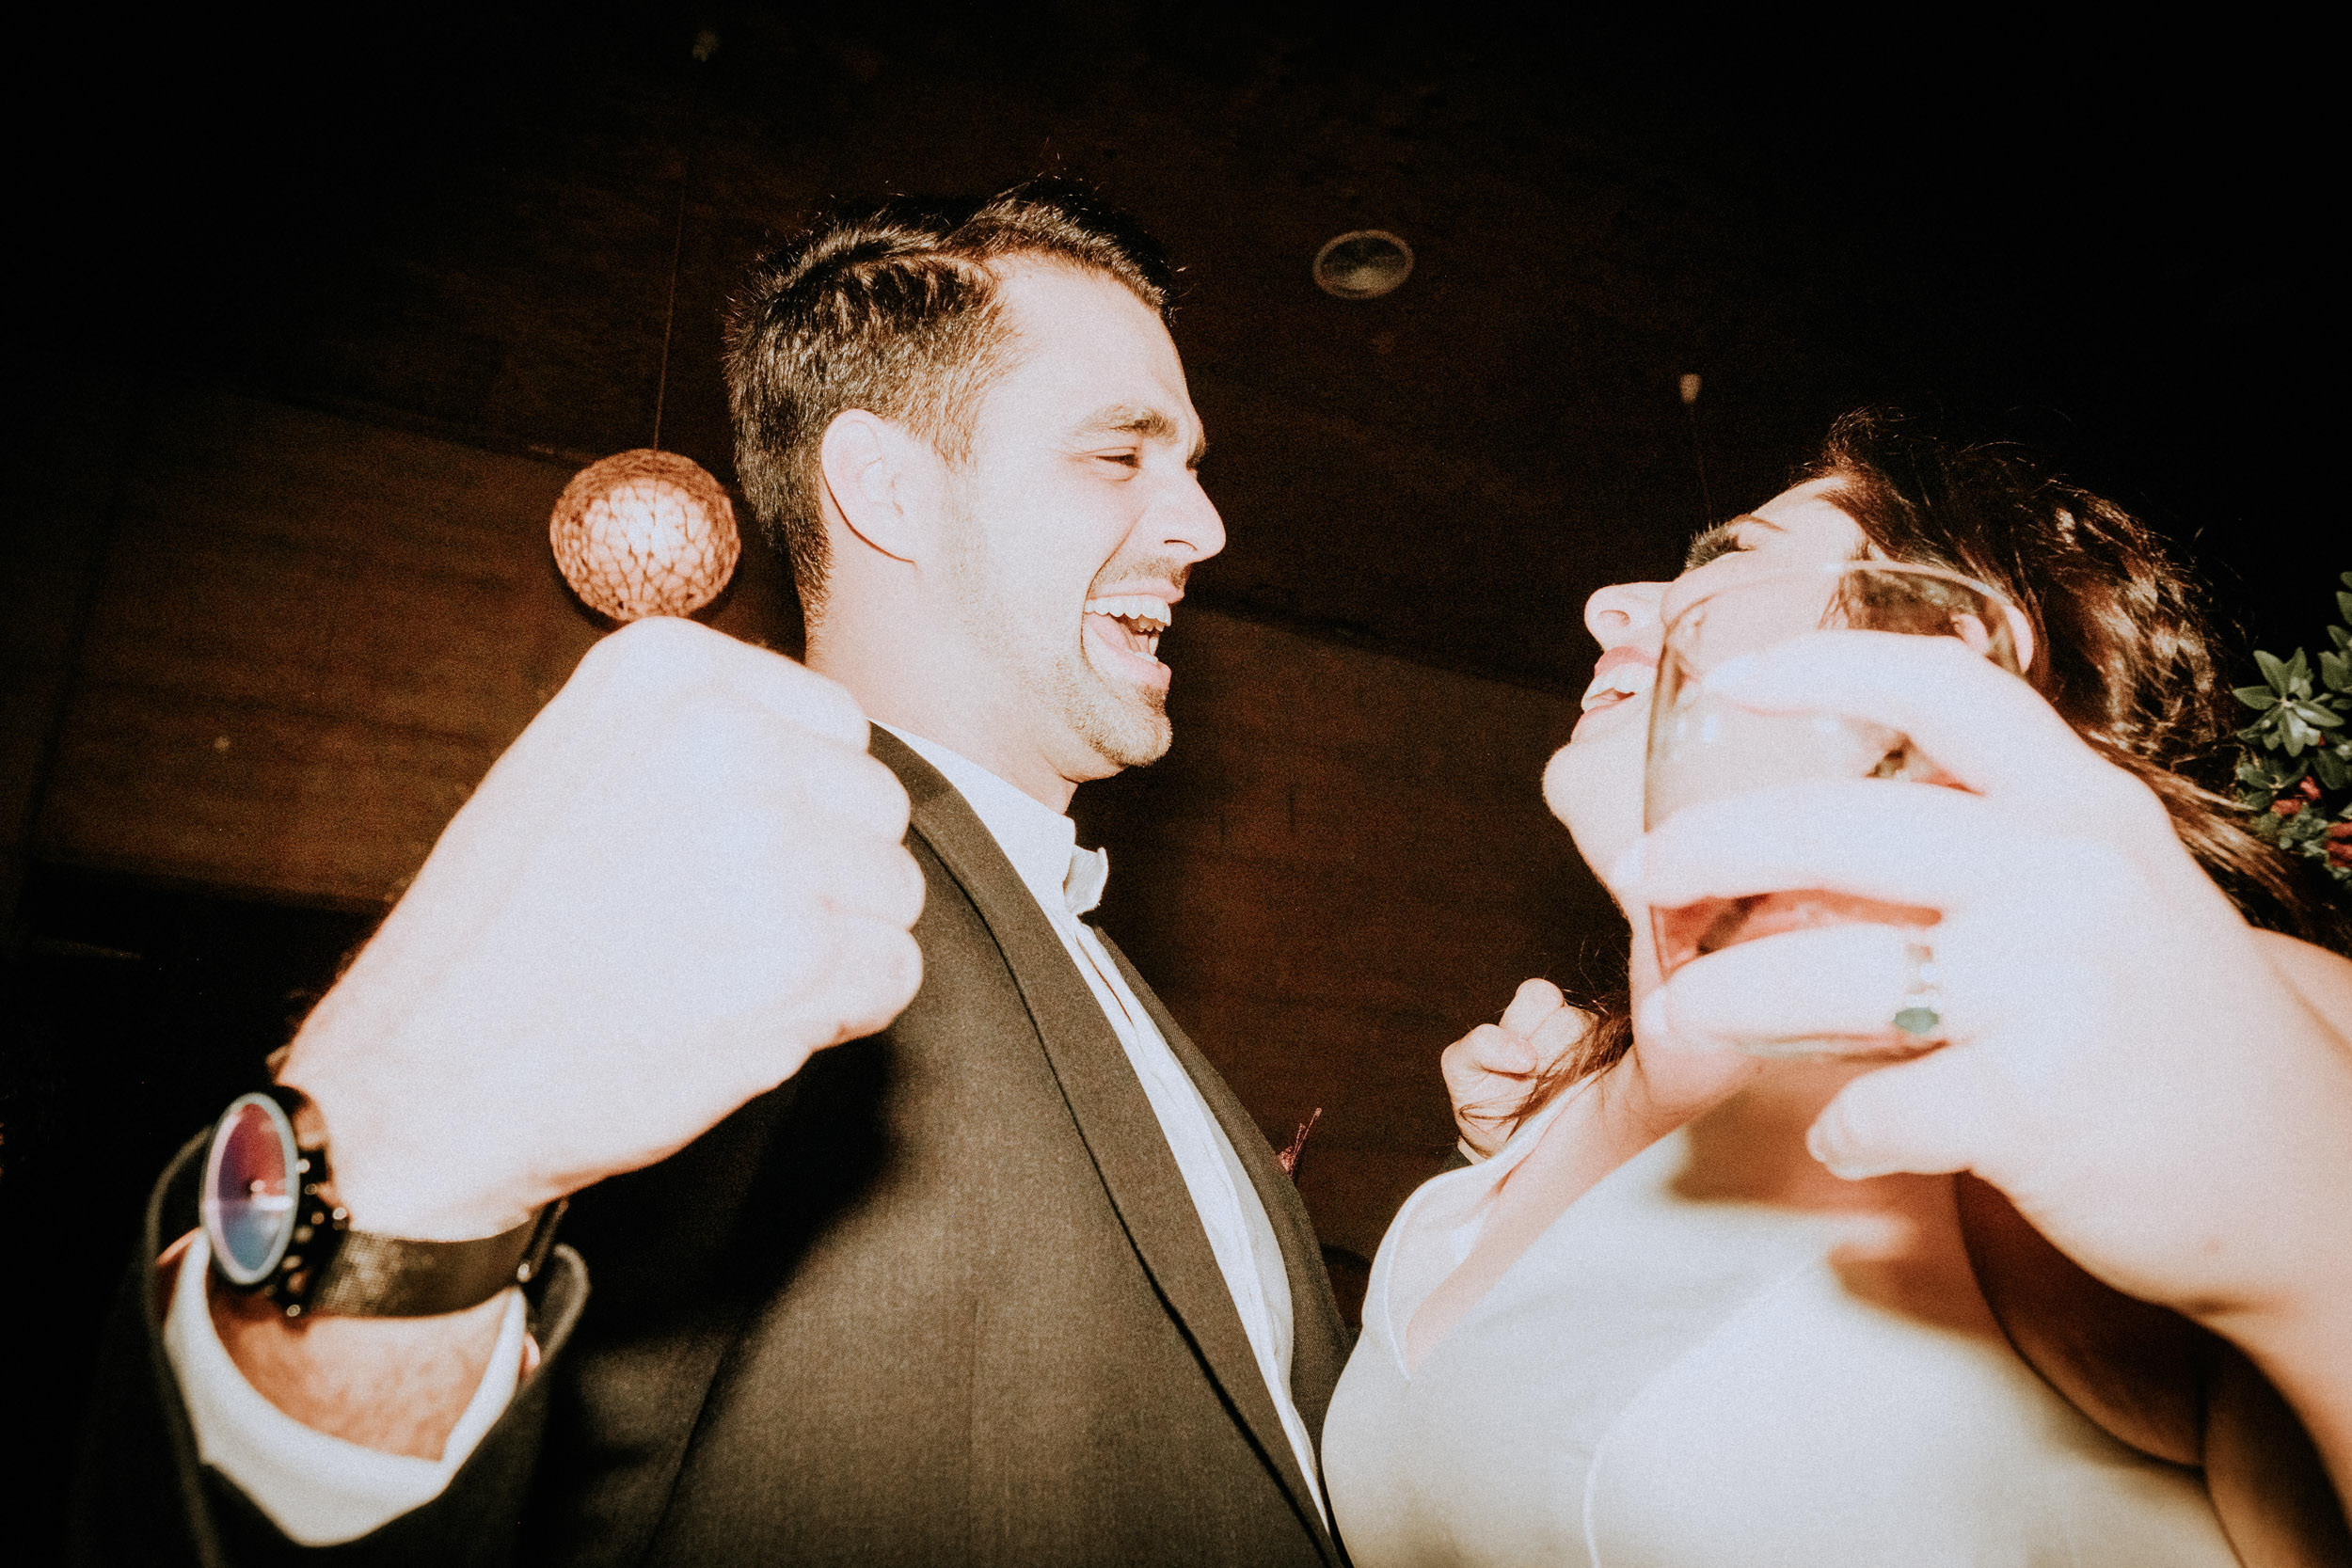 s+j_top_elopement wedding photography_kings & thieves_blog - 554.jpg